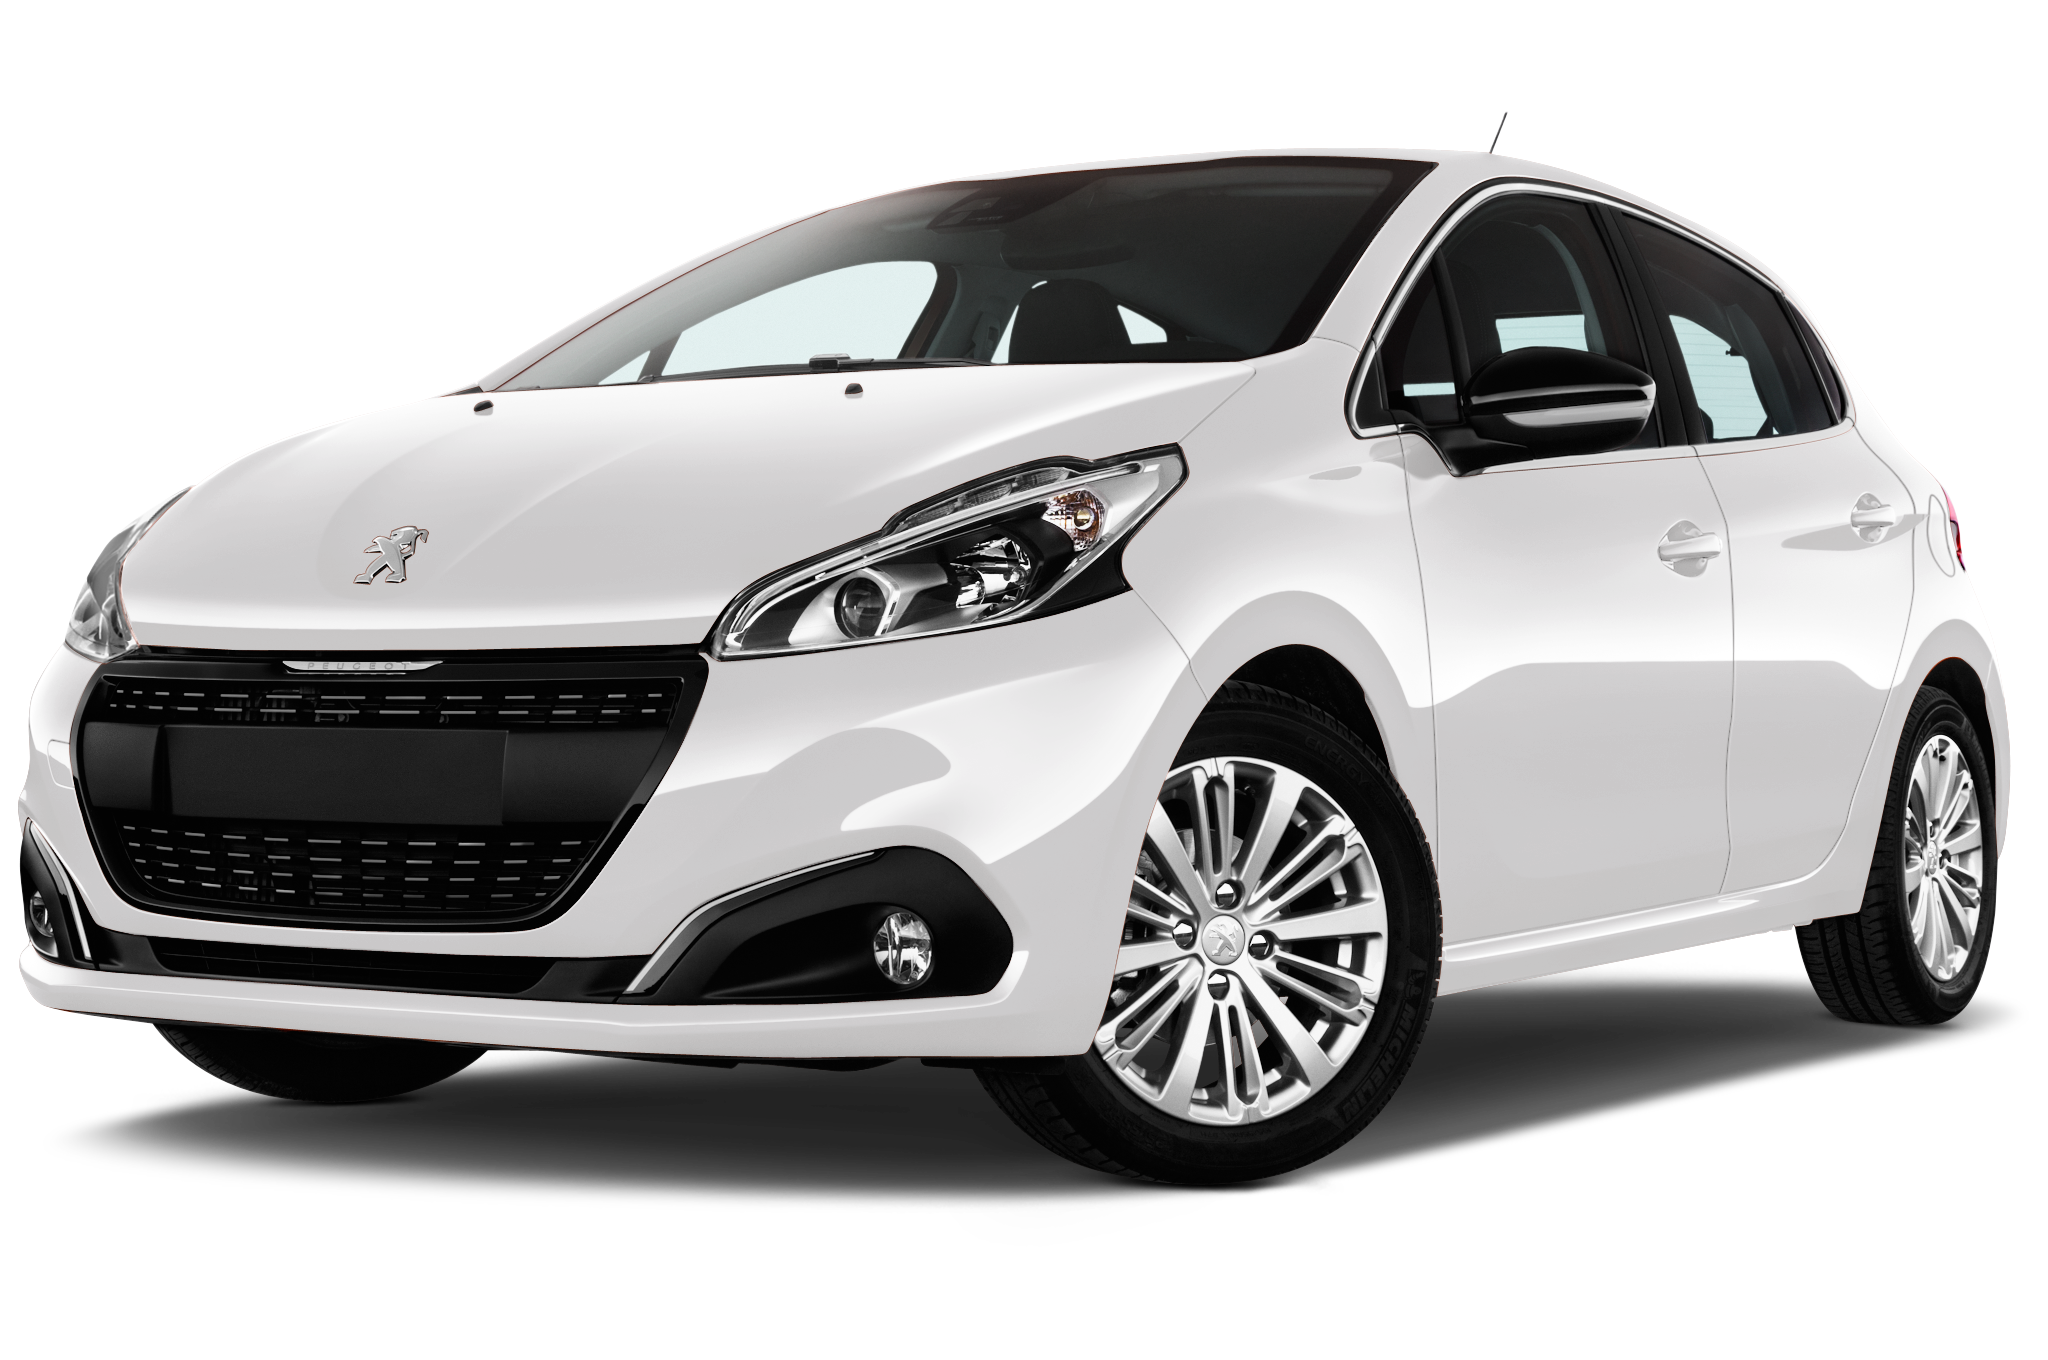 Noleggio a lungo termine per aziende Peugeot 208